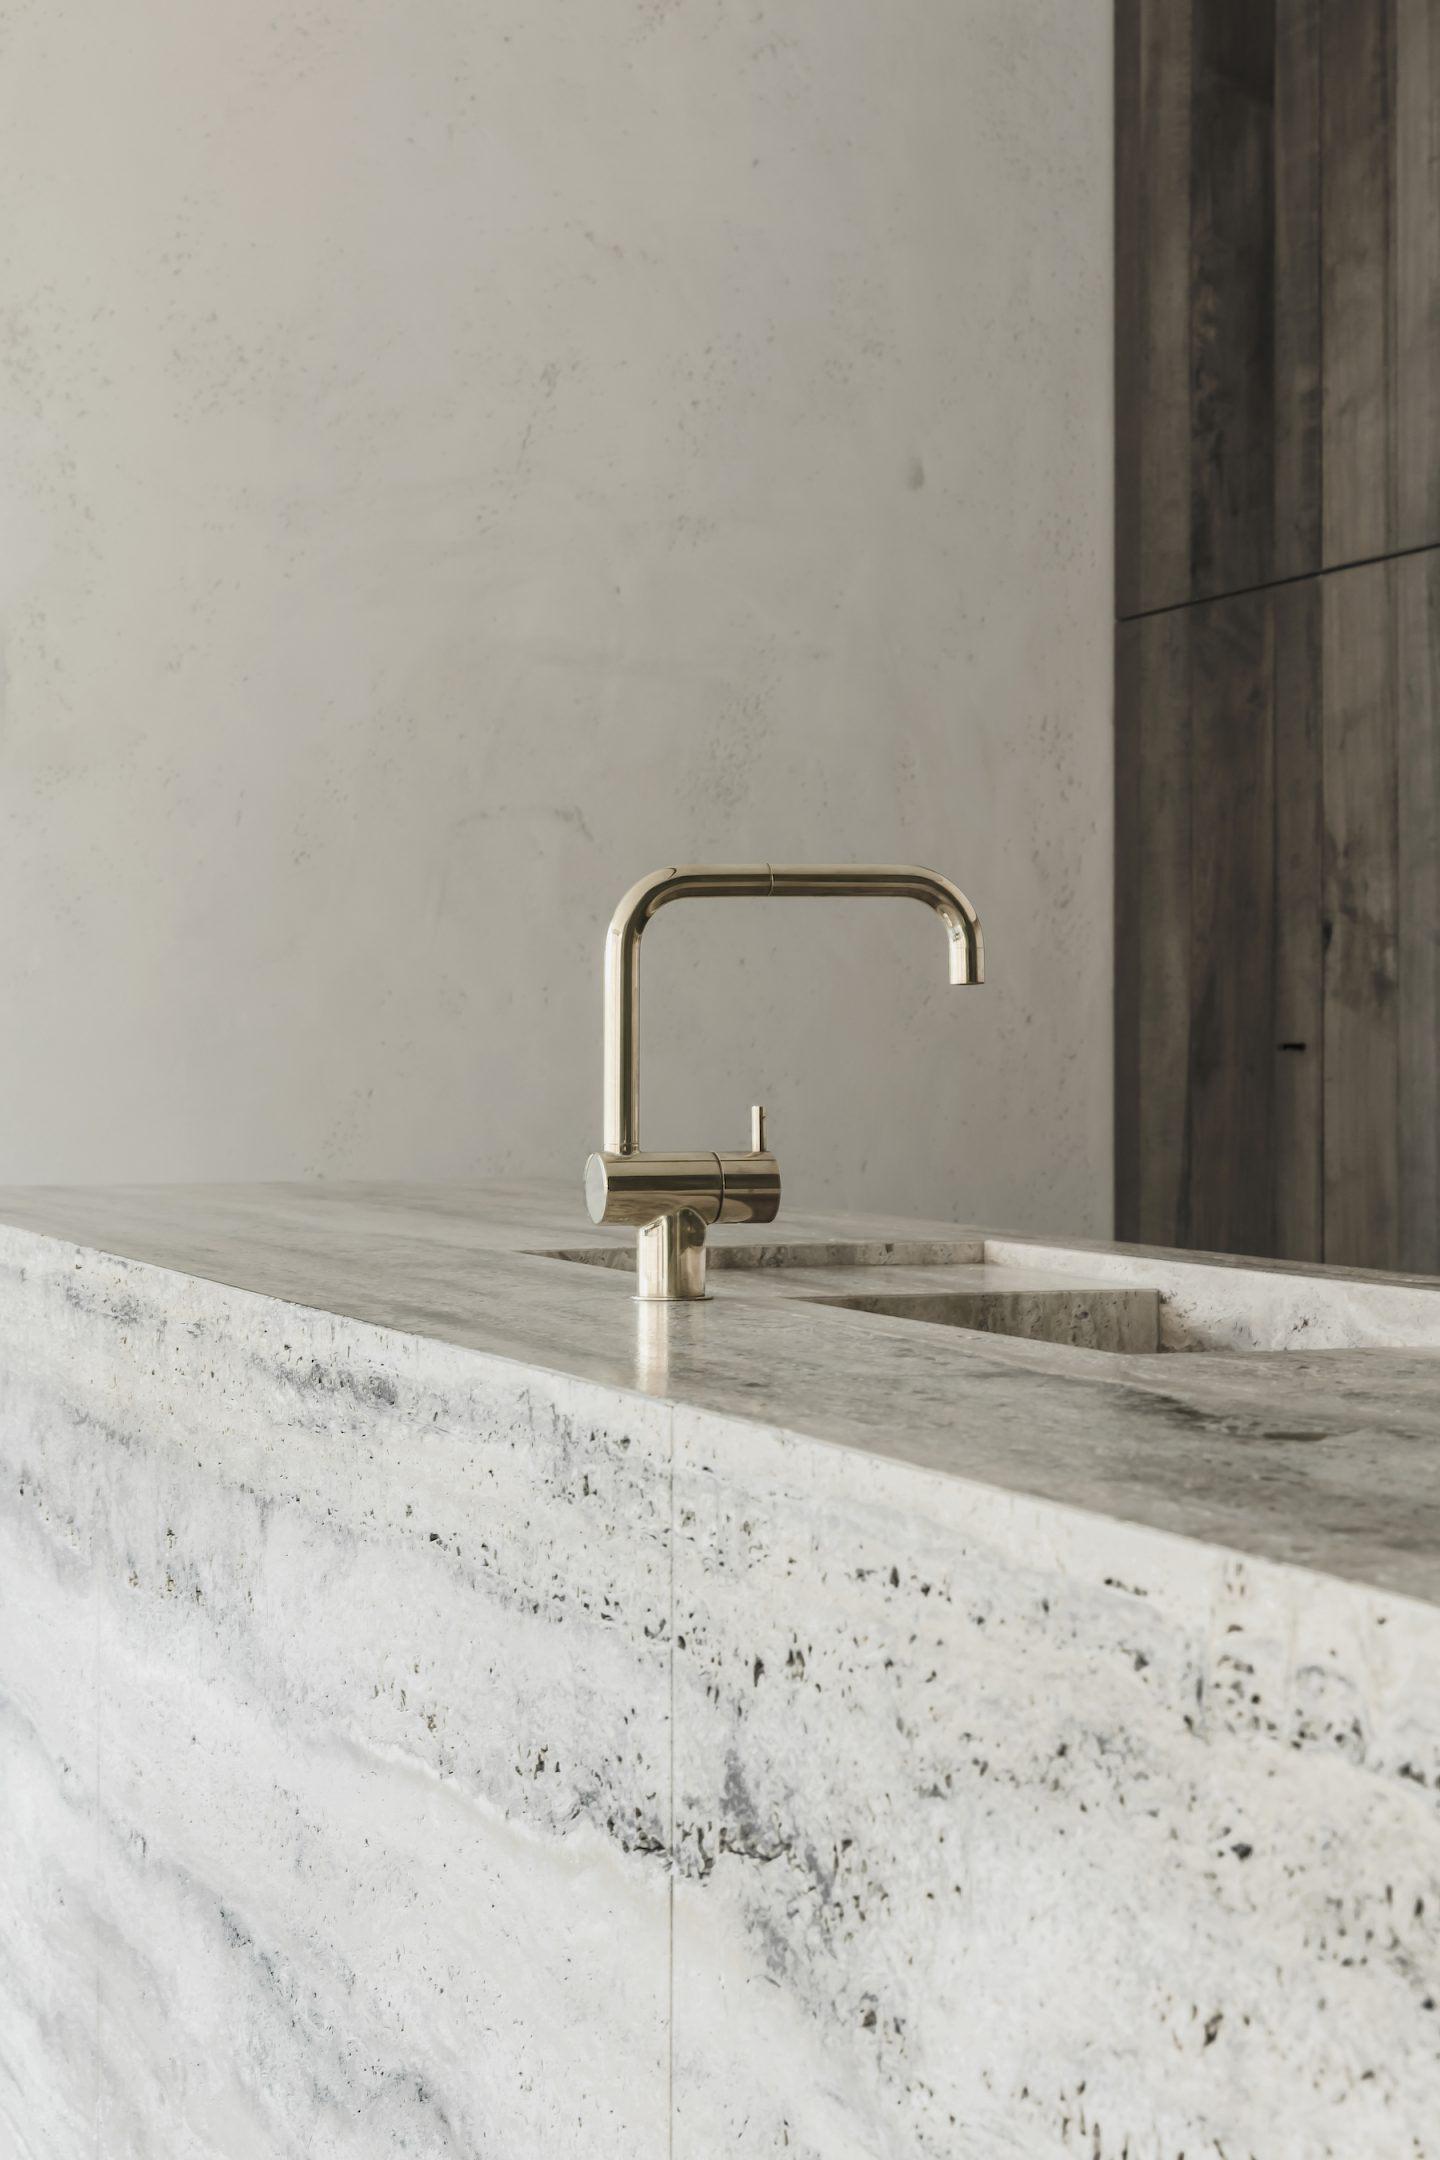 IGNANT-Architecture-Arjaan-De-Feyter-Silo-Apartment-04